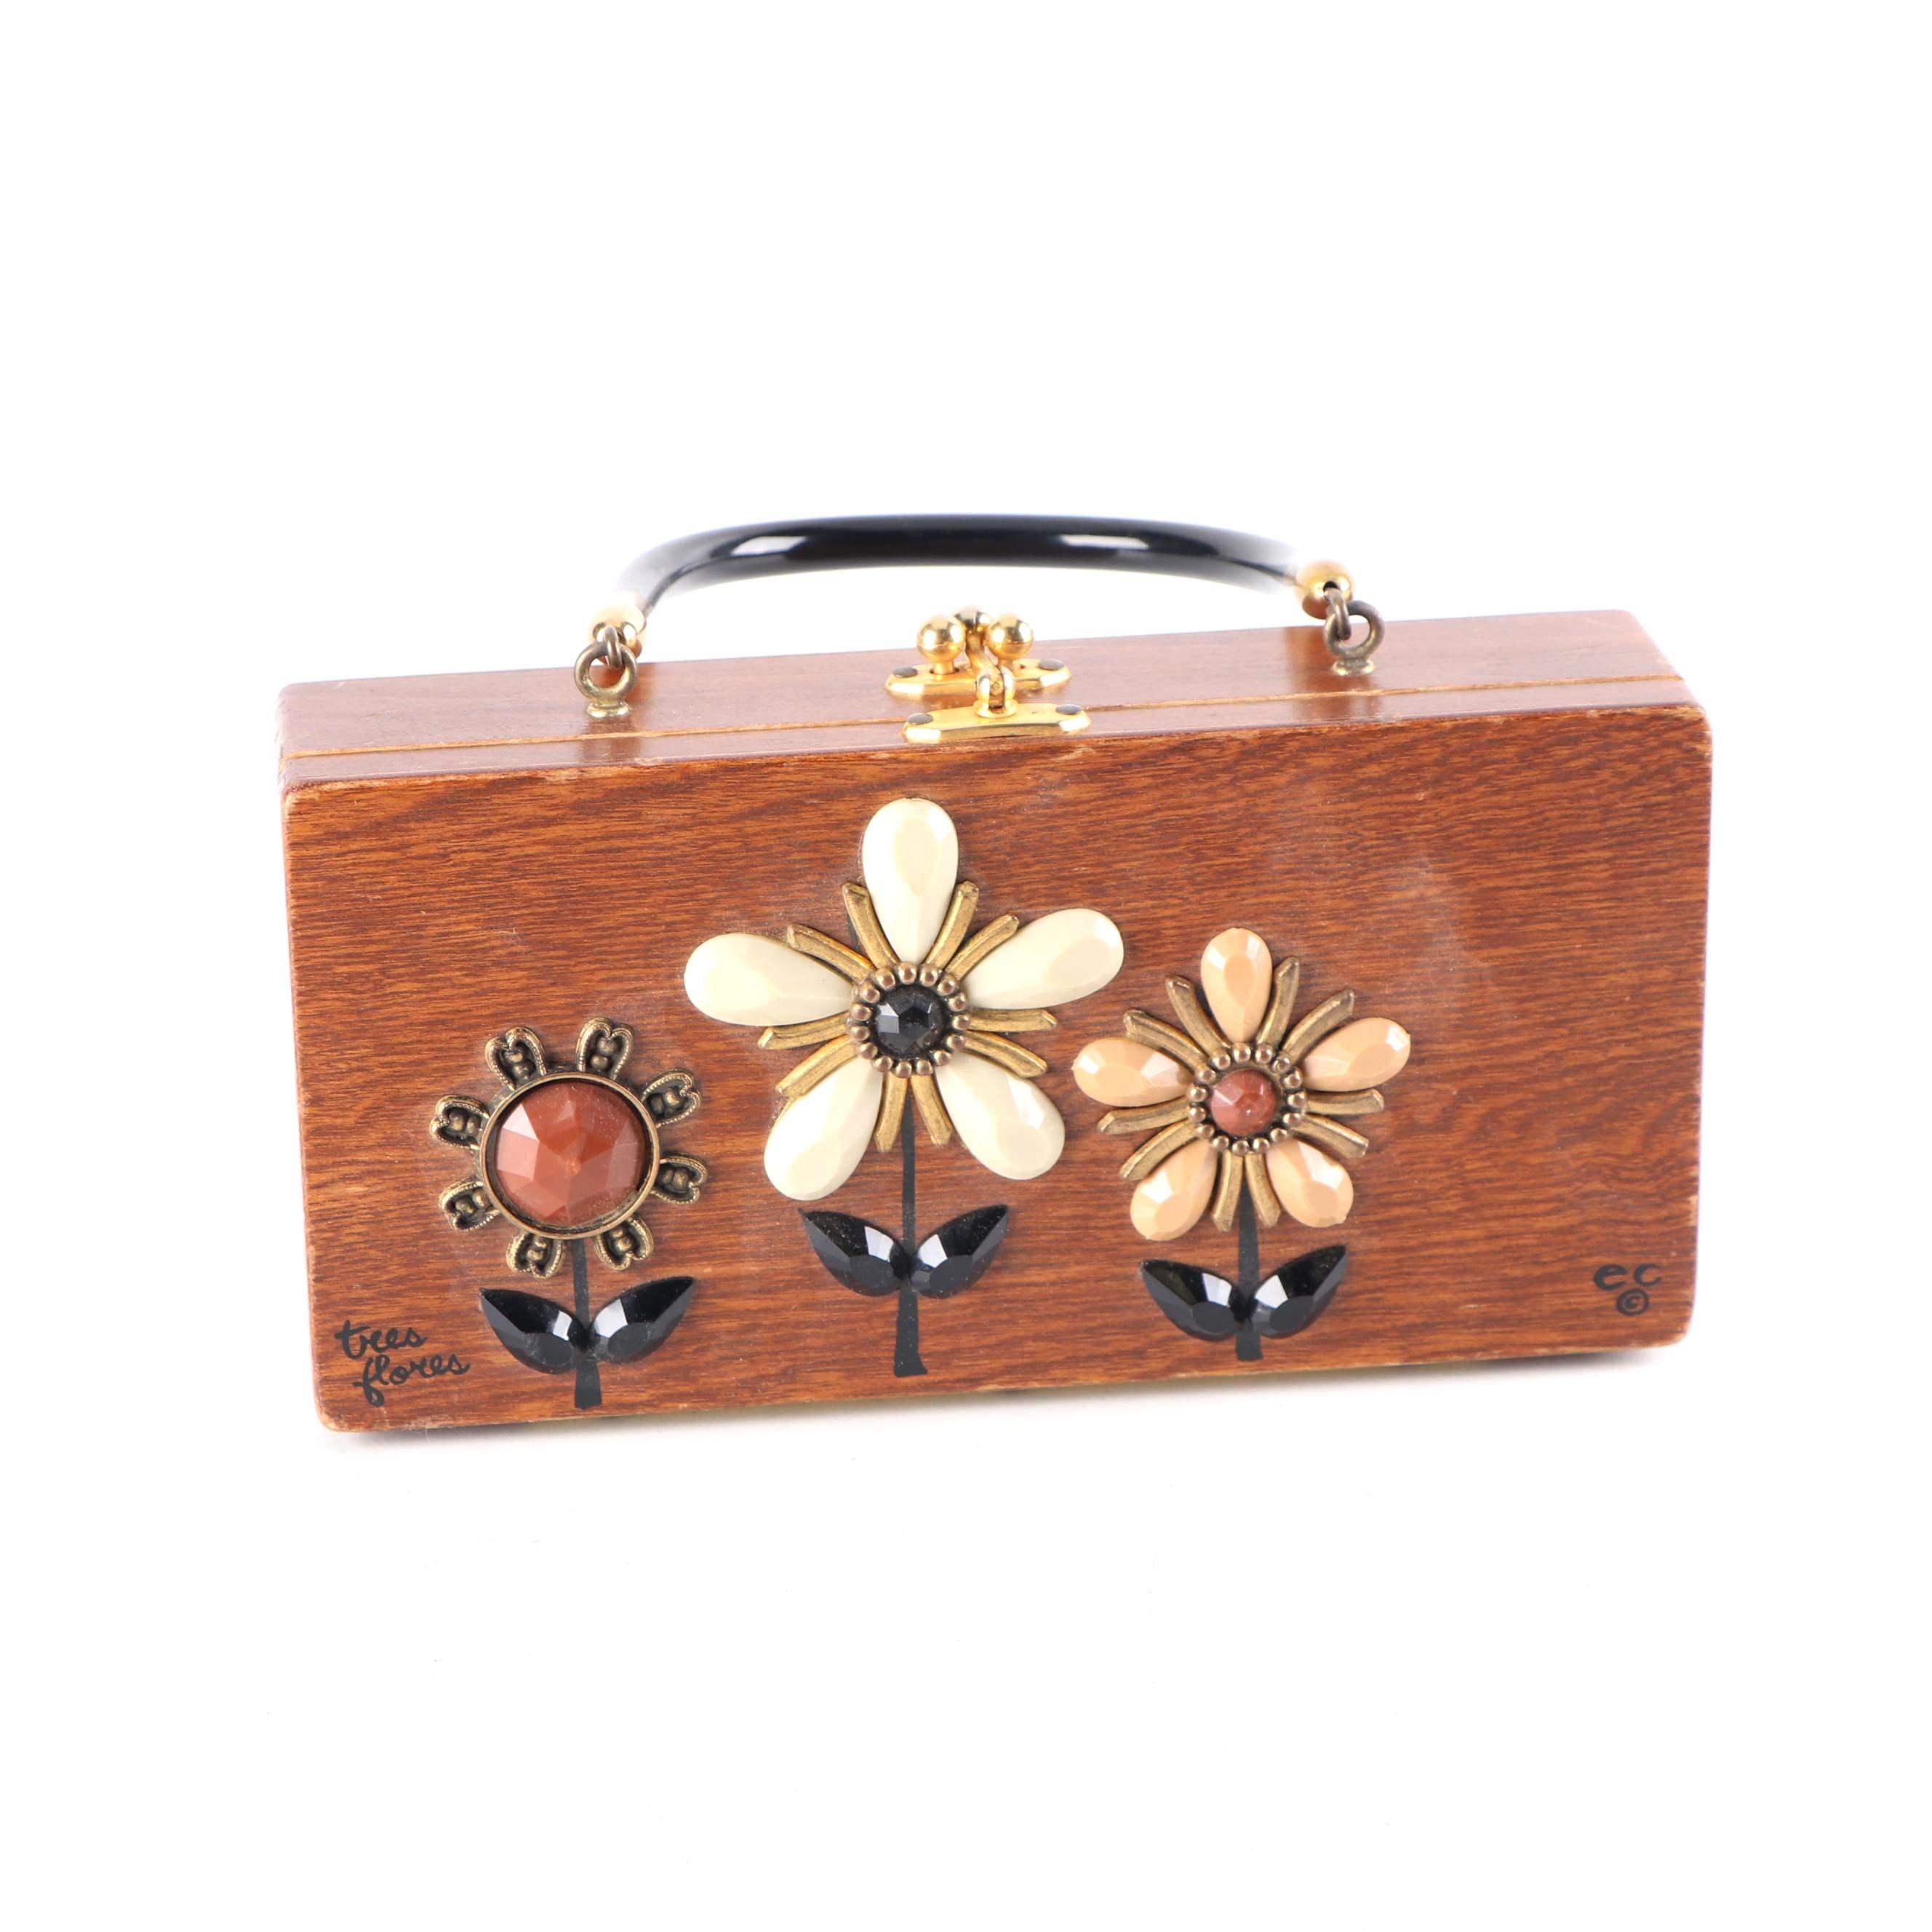 "Enid Collins of Texas ""Tres Flores"" Wooden Box Purse, 1960s Vintage"